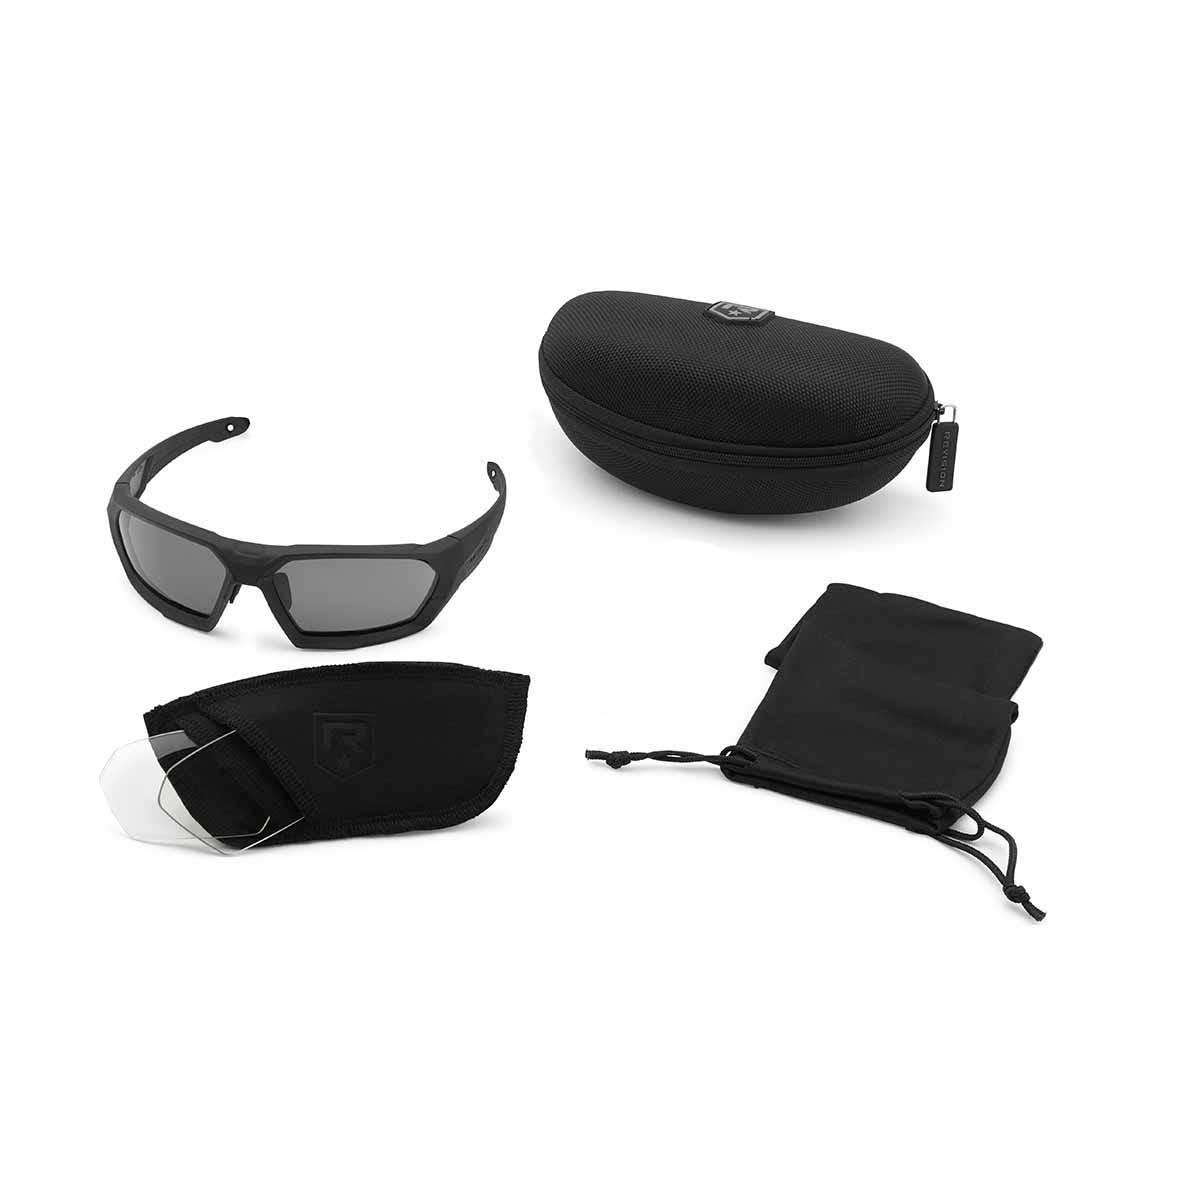 Revision Military Shadowstrike Ballistic Sunglasses Military Kit One ... Black